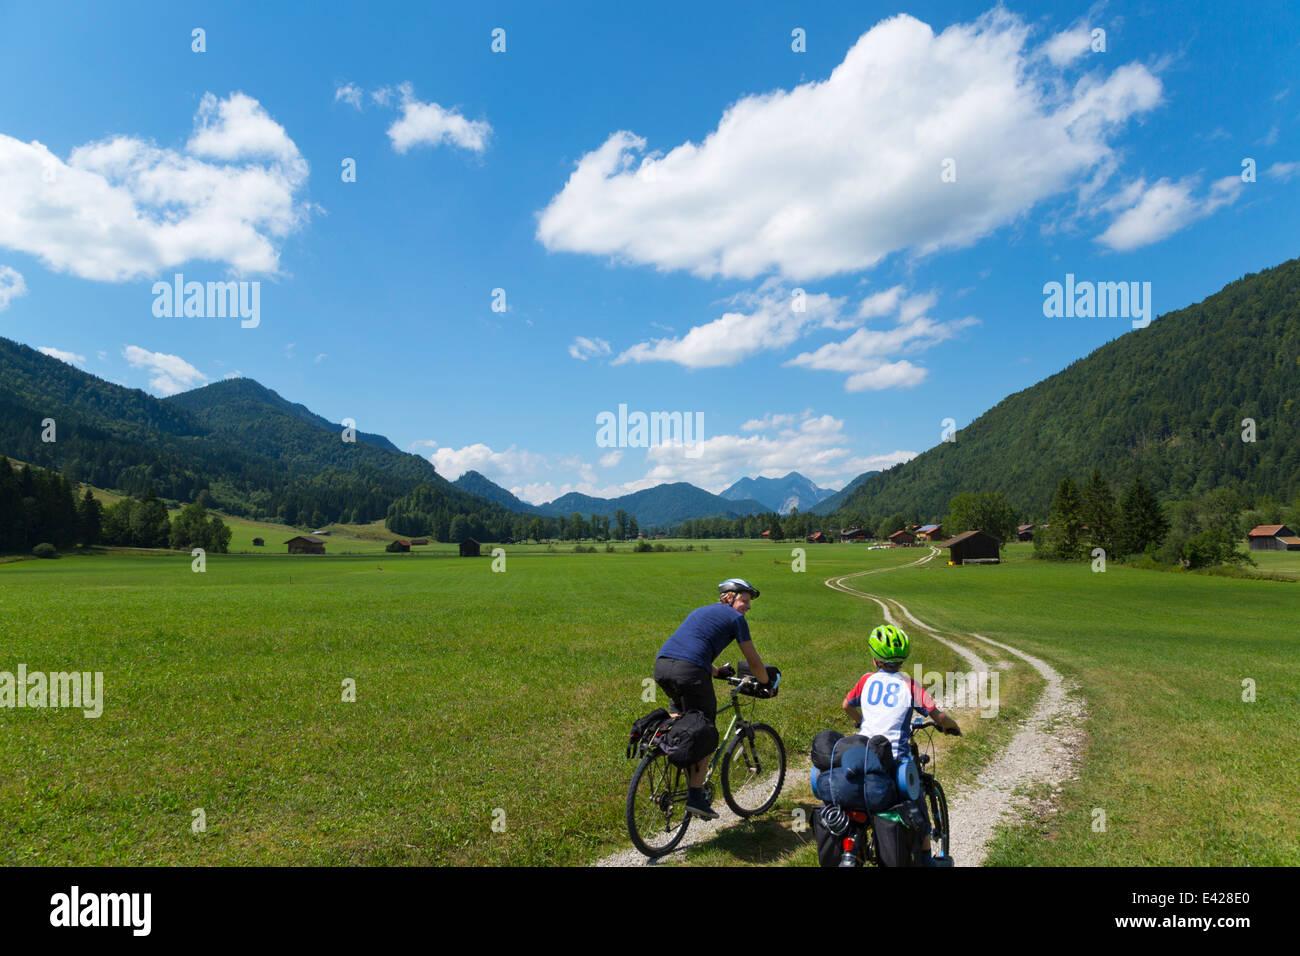 Padre e hijo en bicicleta a través de Jachenau, Baviera, Alemania Imagen De Stock